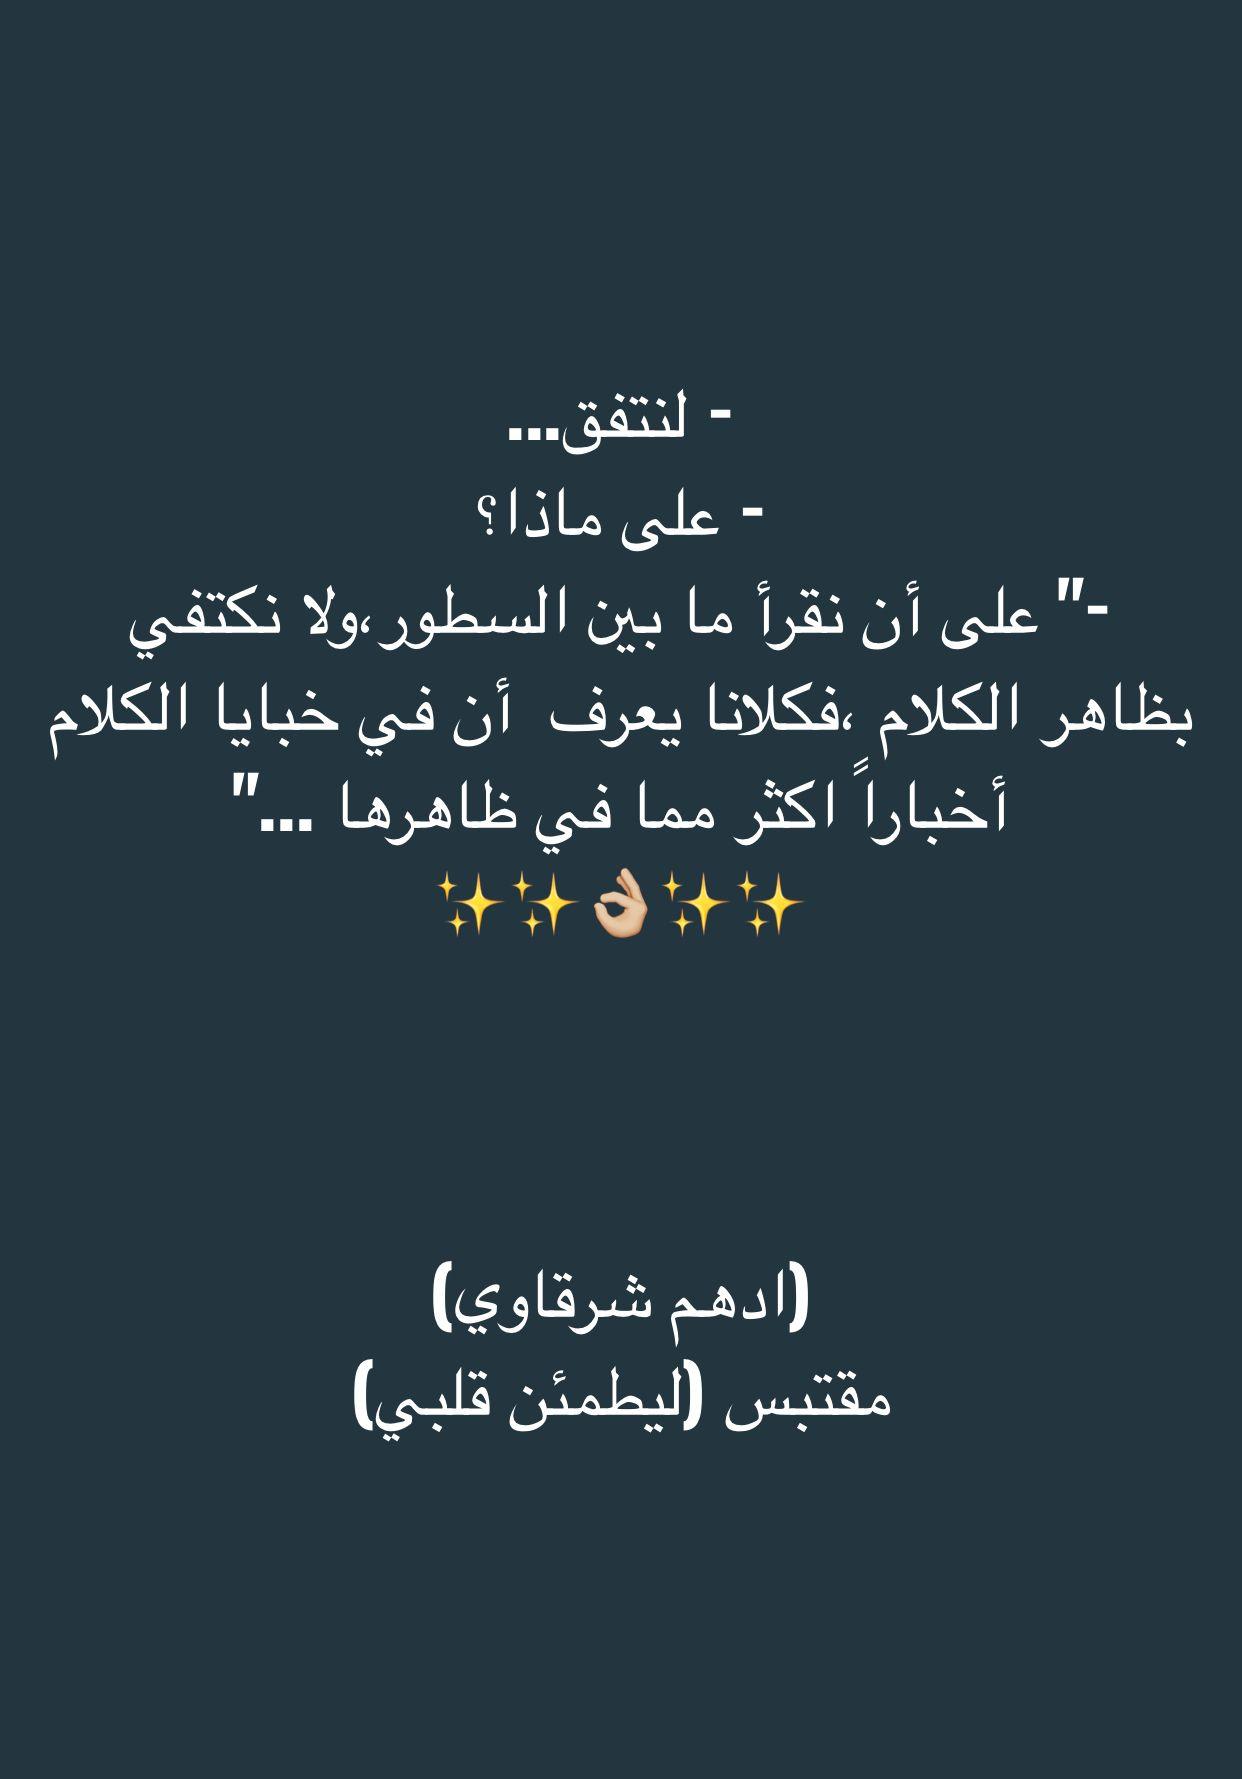 هل اتفقنا Words Quotes Beautiful Arabic Words Arabic Words